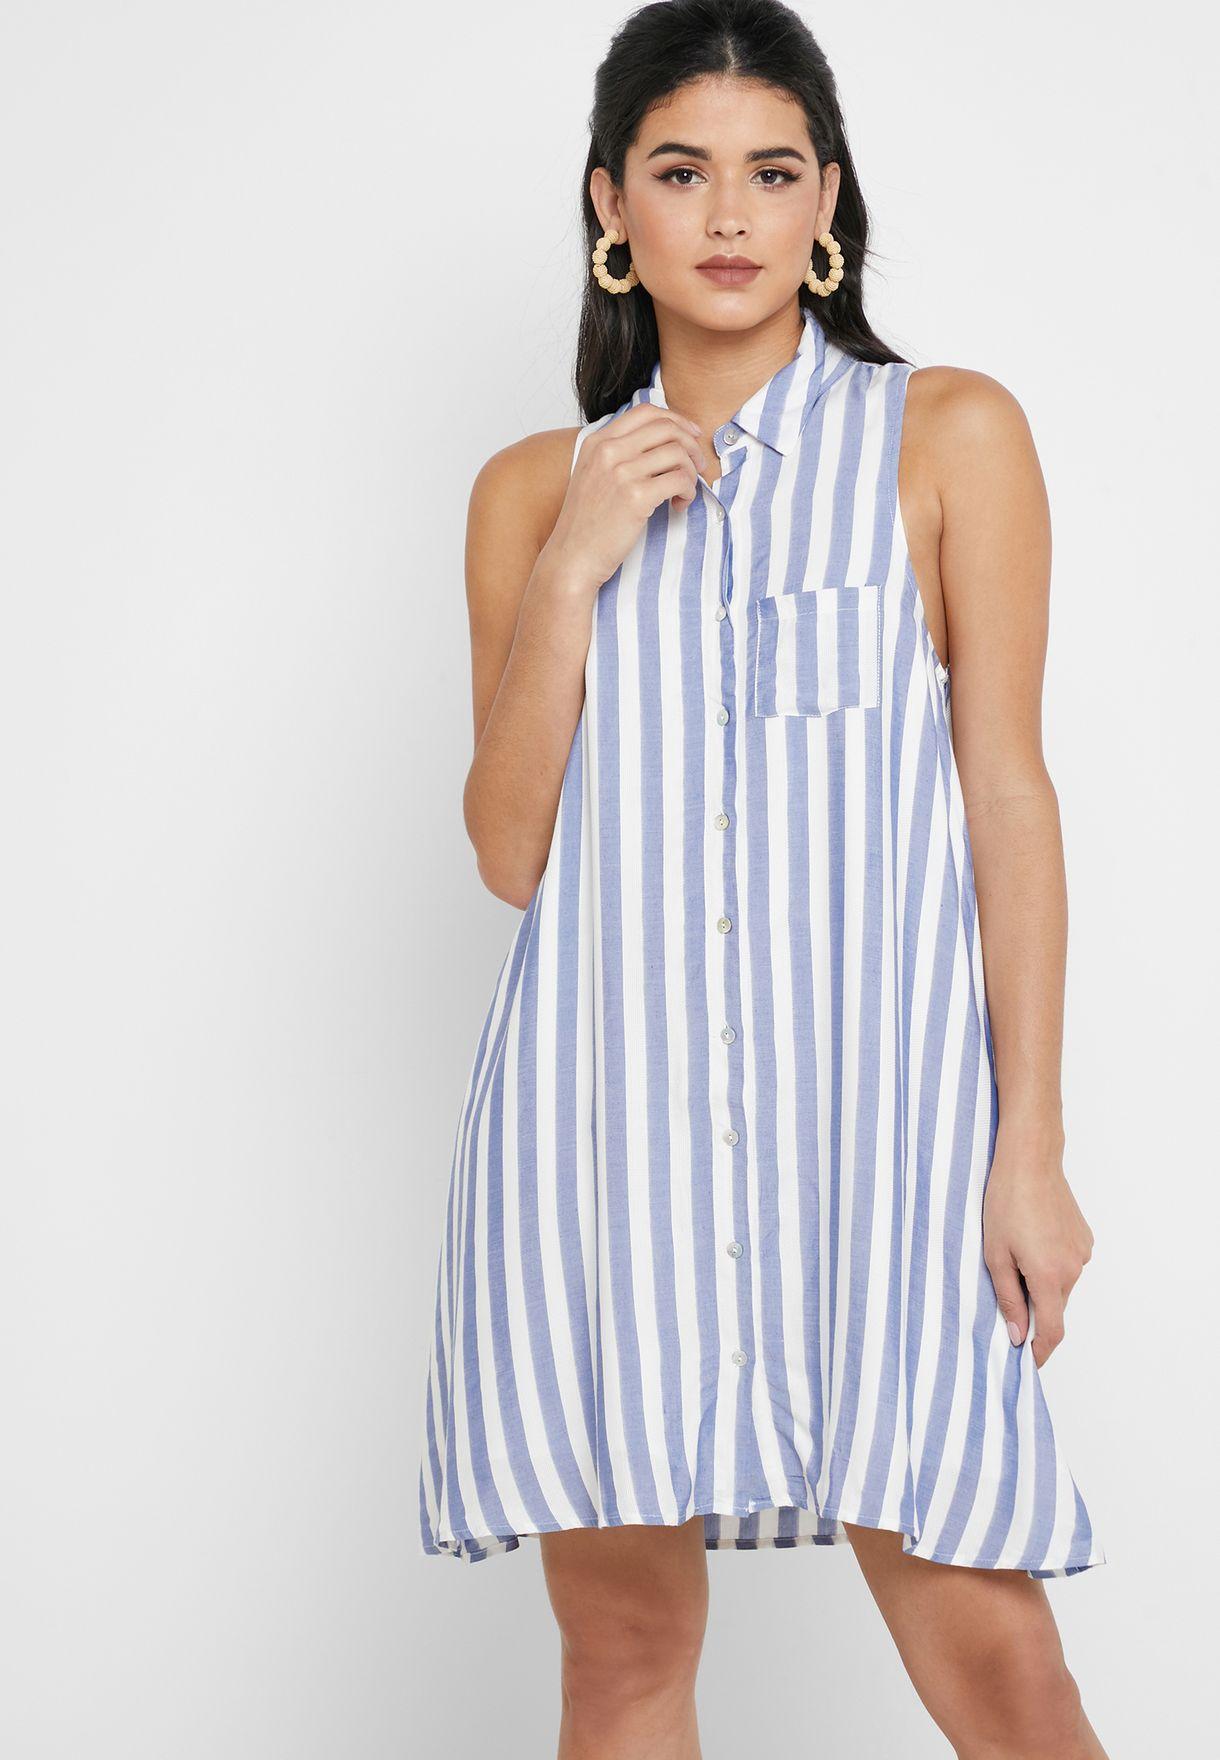 فستان مزين بخطوط